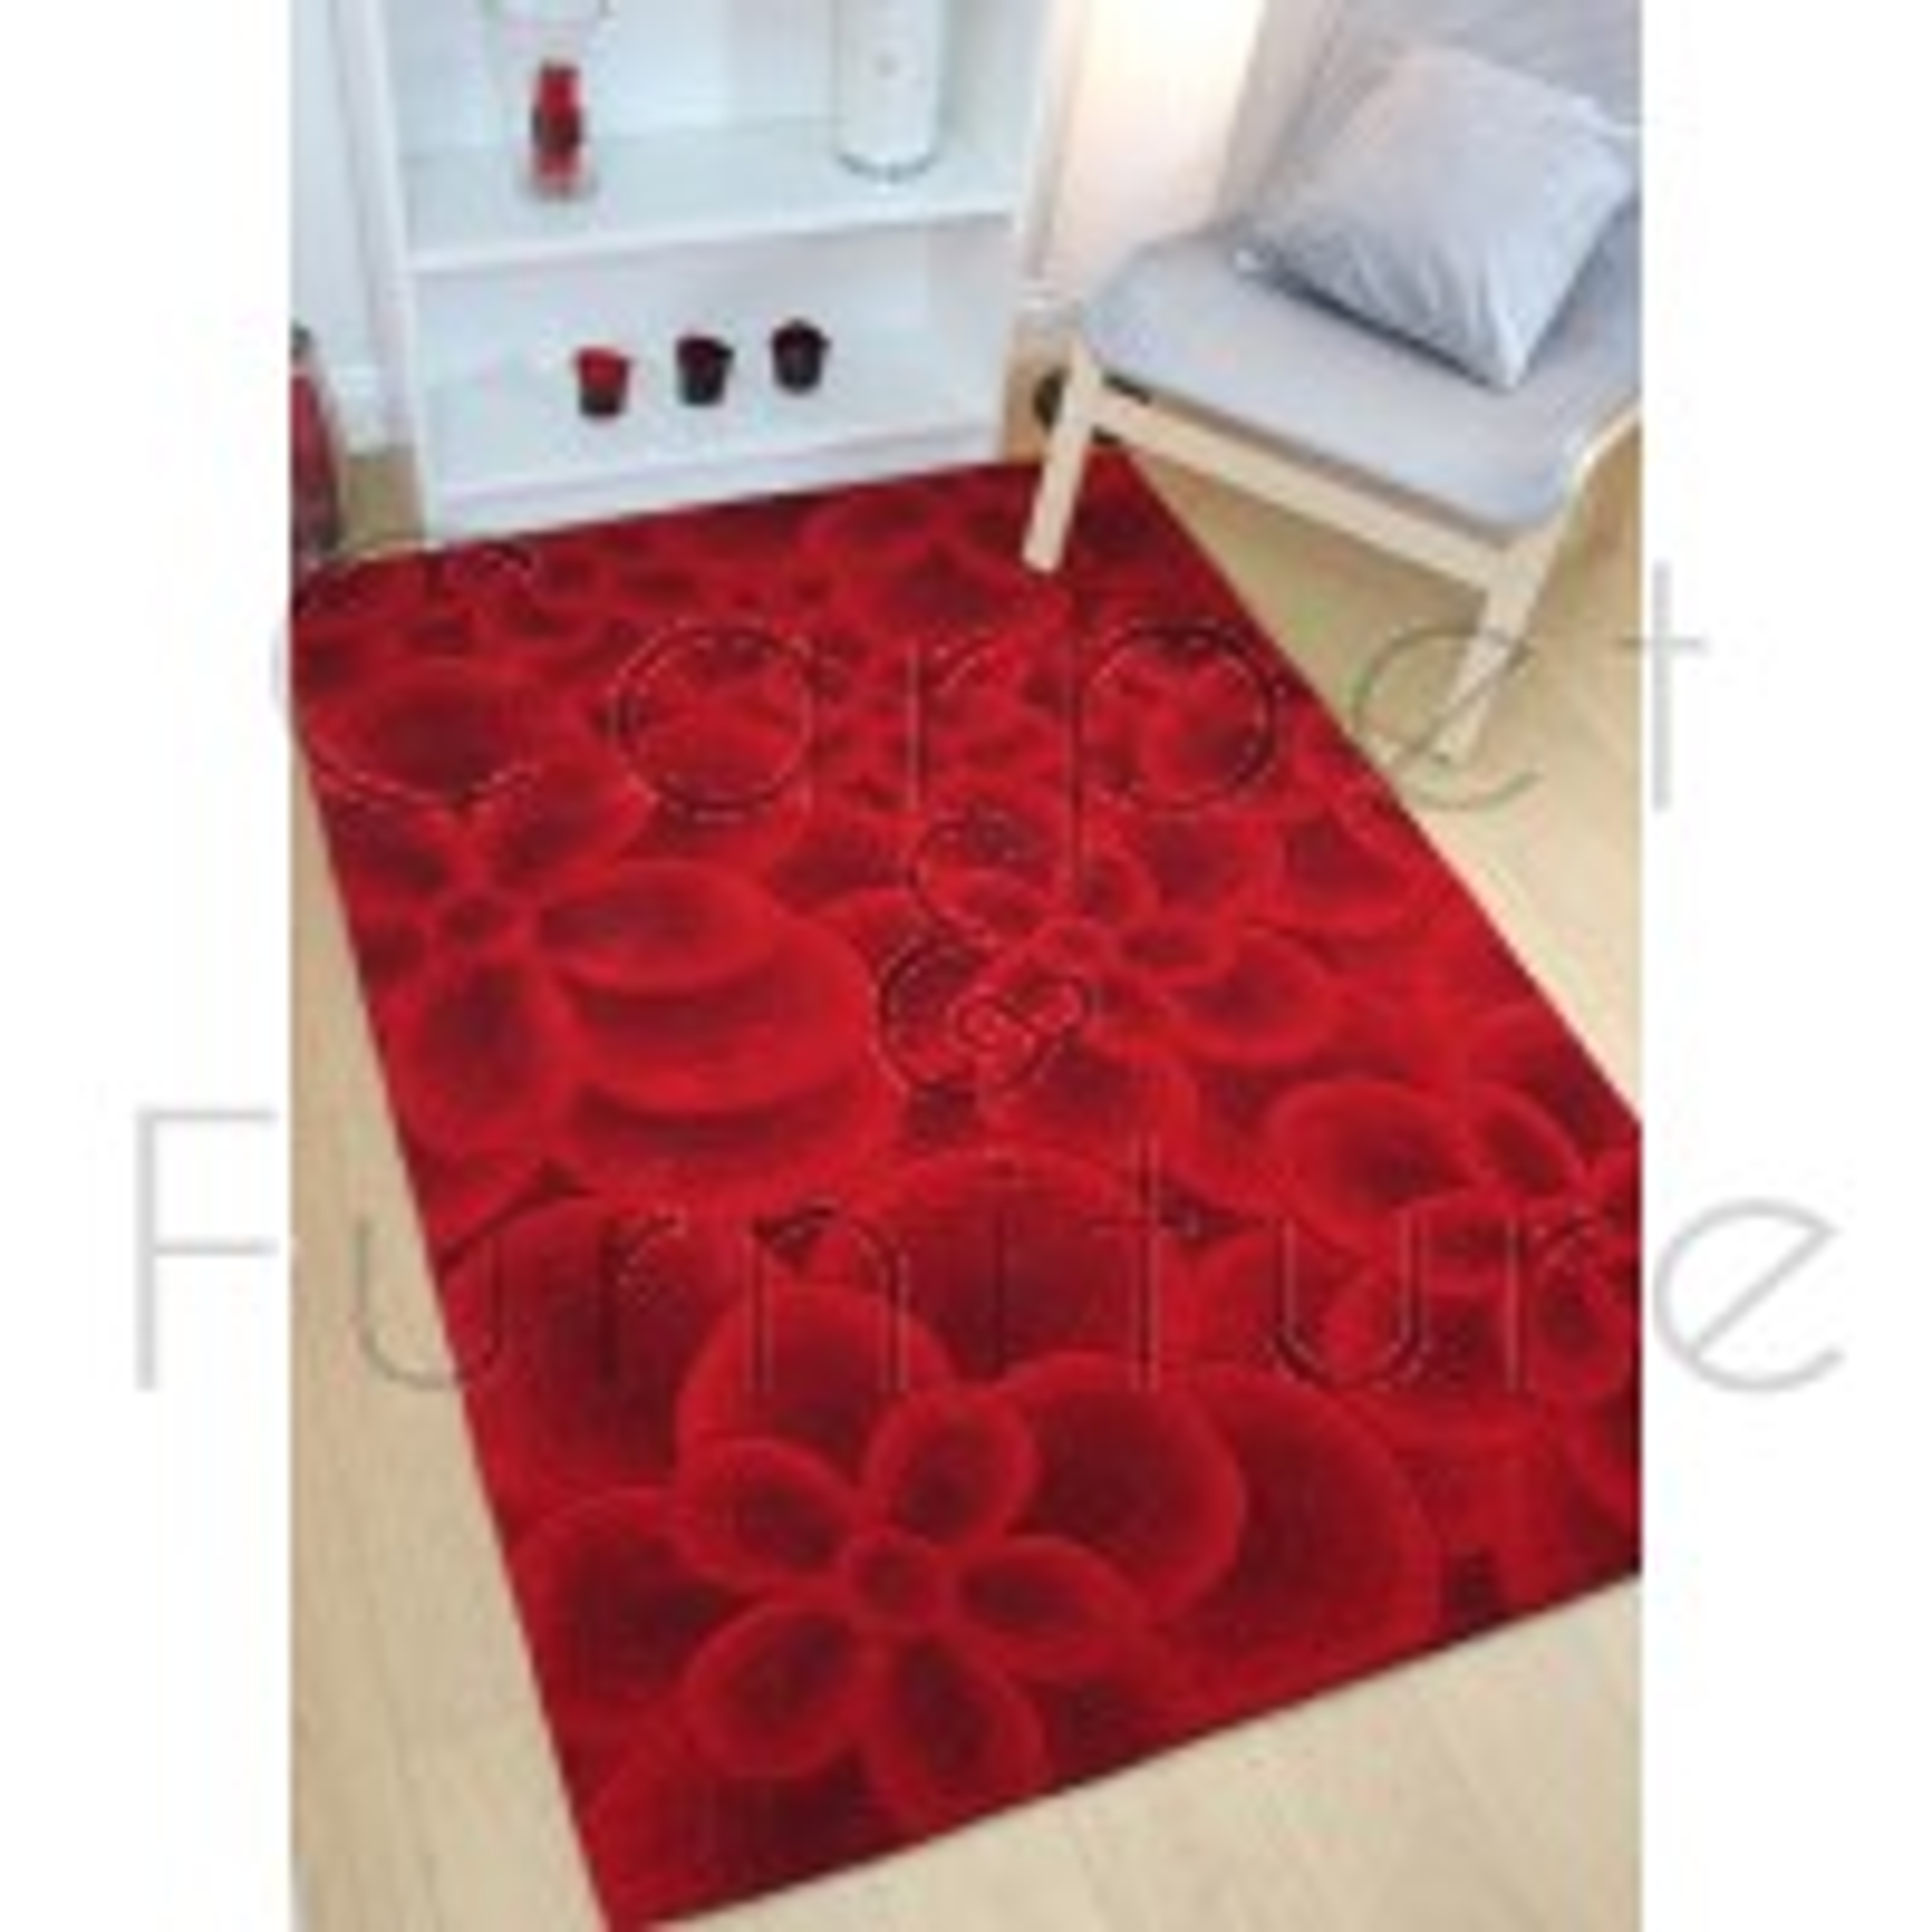 "Regent Chesham Red Rug - Size 120 x 170 cm (4' x 5'7"")"